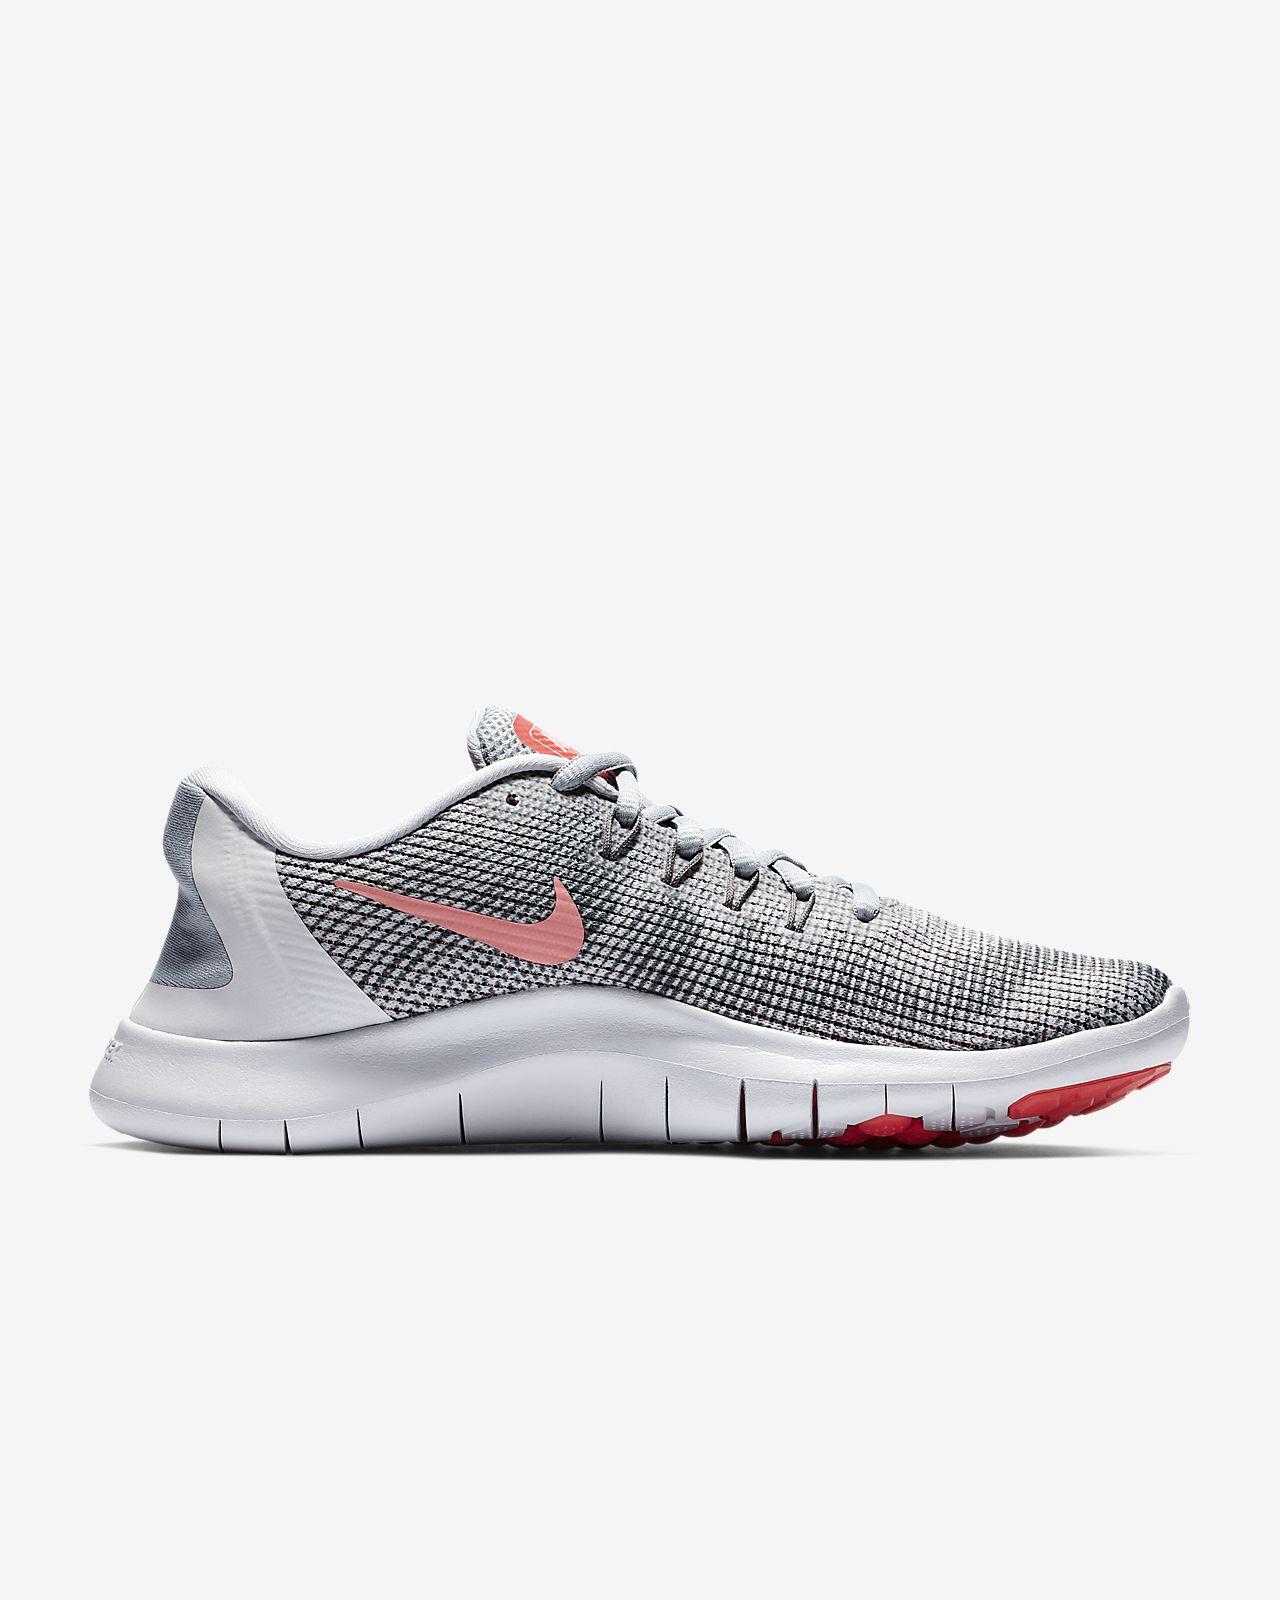 61b70ed18bd Calzado de running para mujer Nike Flex RN 2018. Nike.com MX